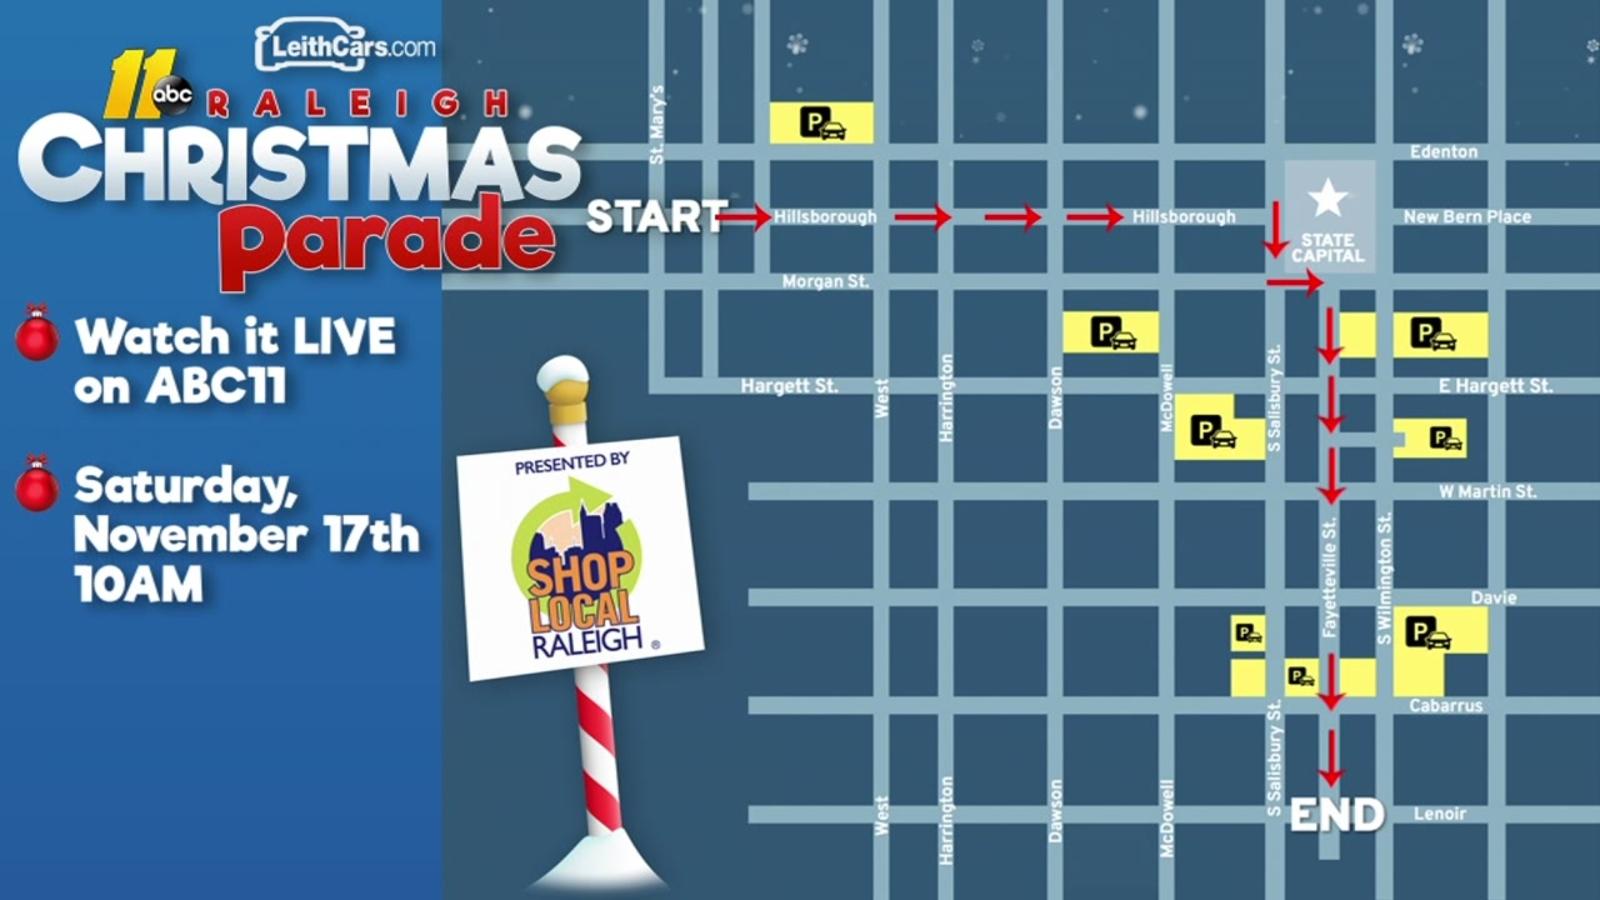 Raleigh Christmas Parade Route 2019 Raleigh Christmas Parade Route Map   abc11.com